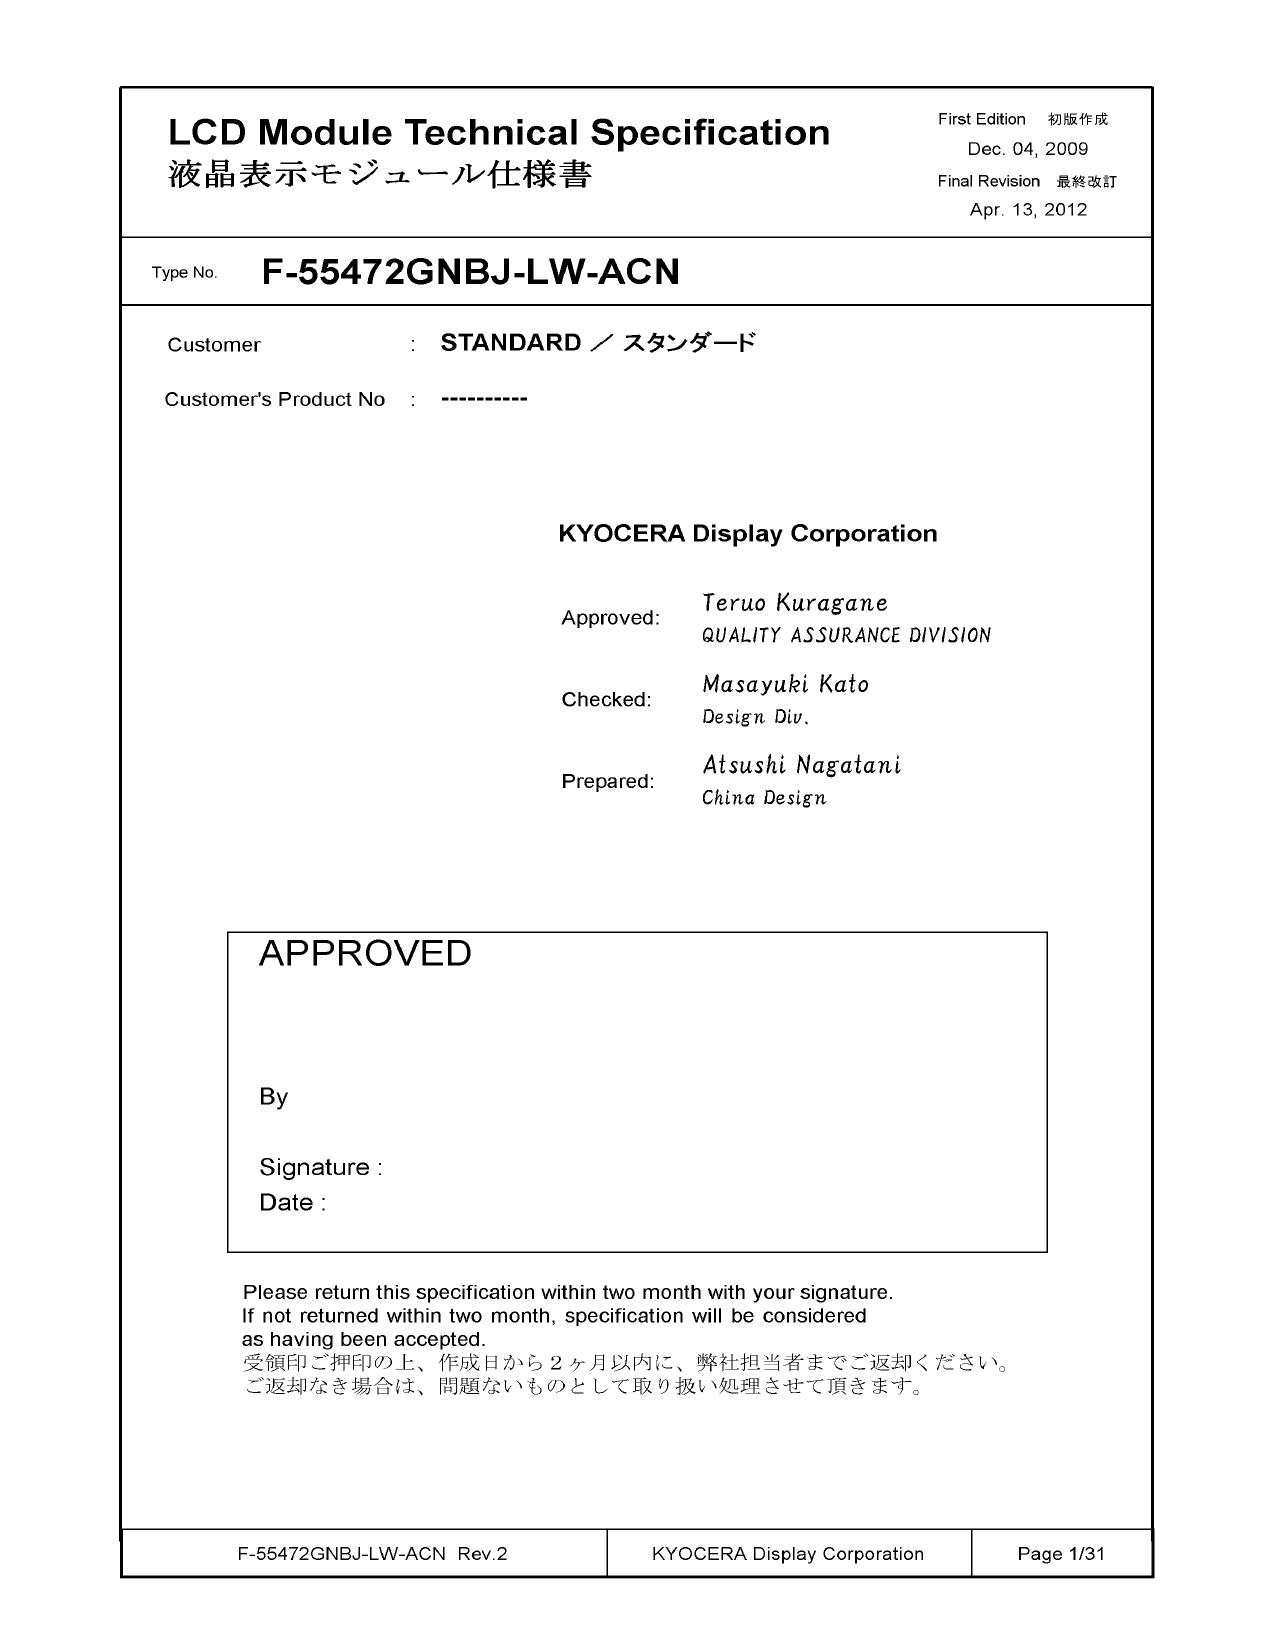 F-55472GNBJ-LW-ACN دیتاشیت PDF